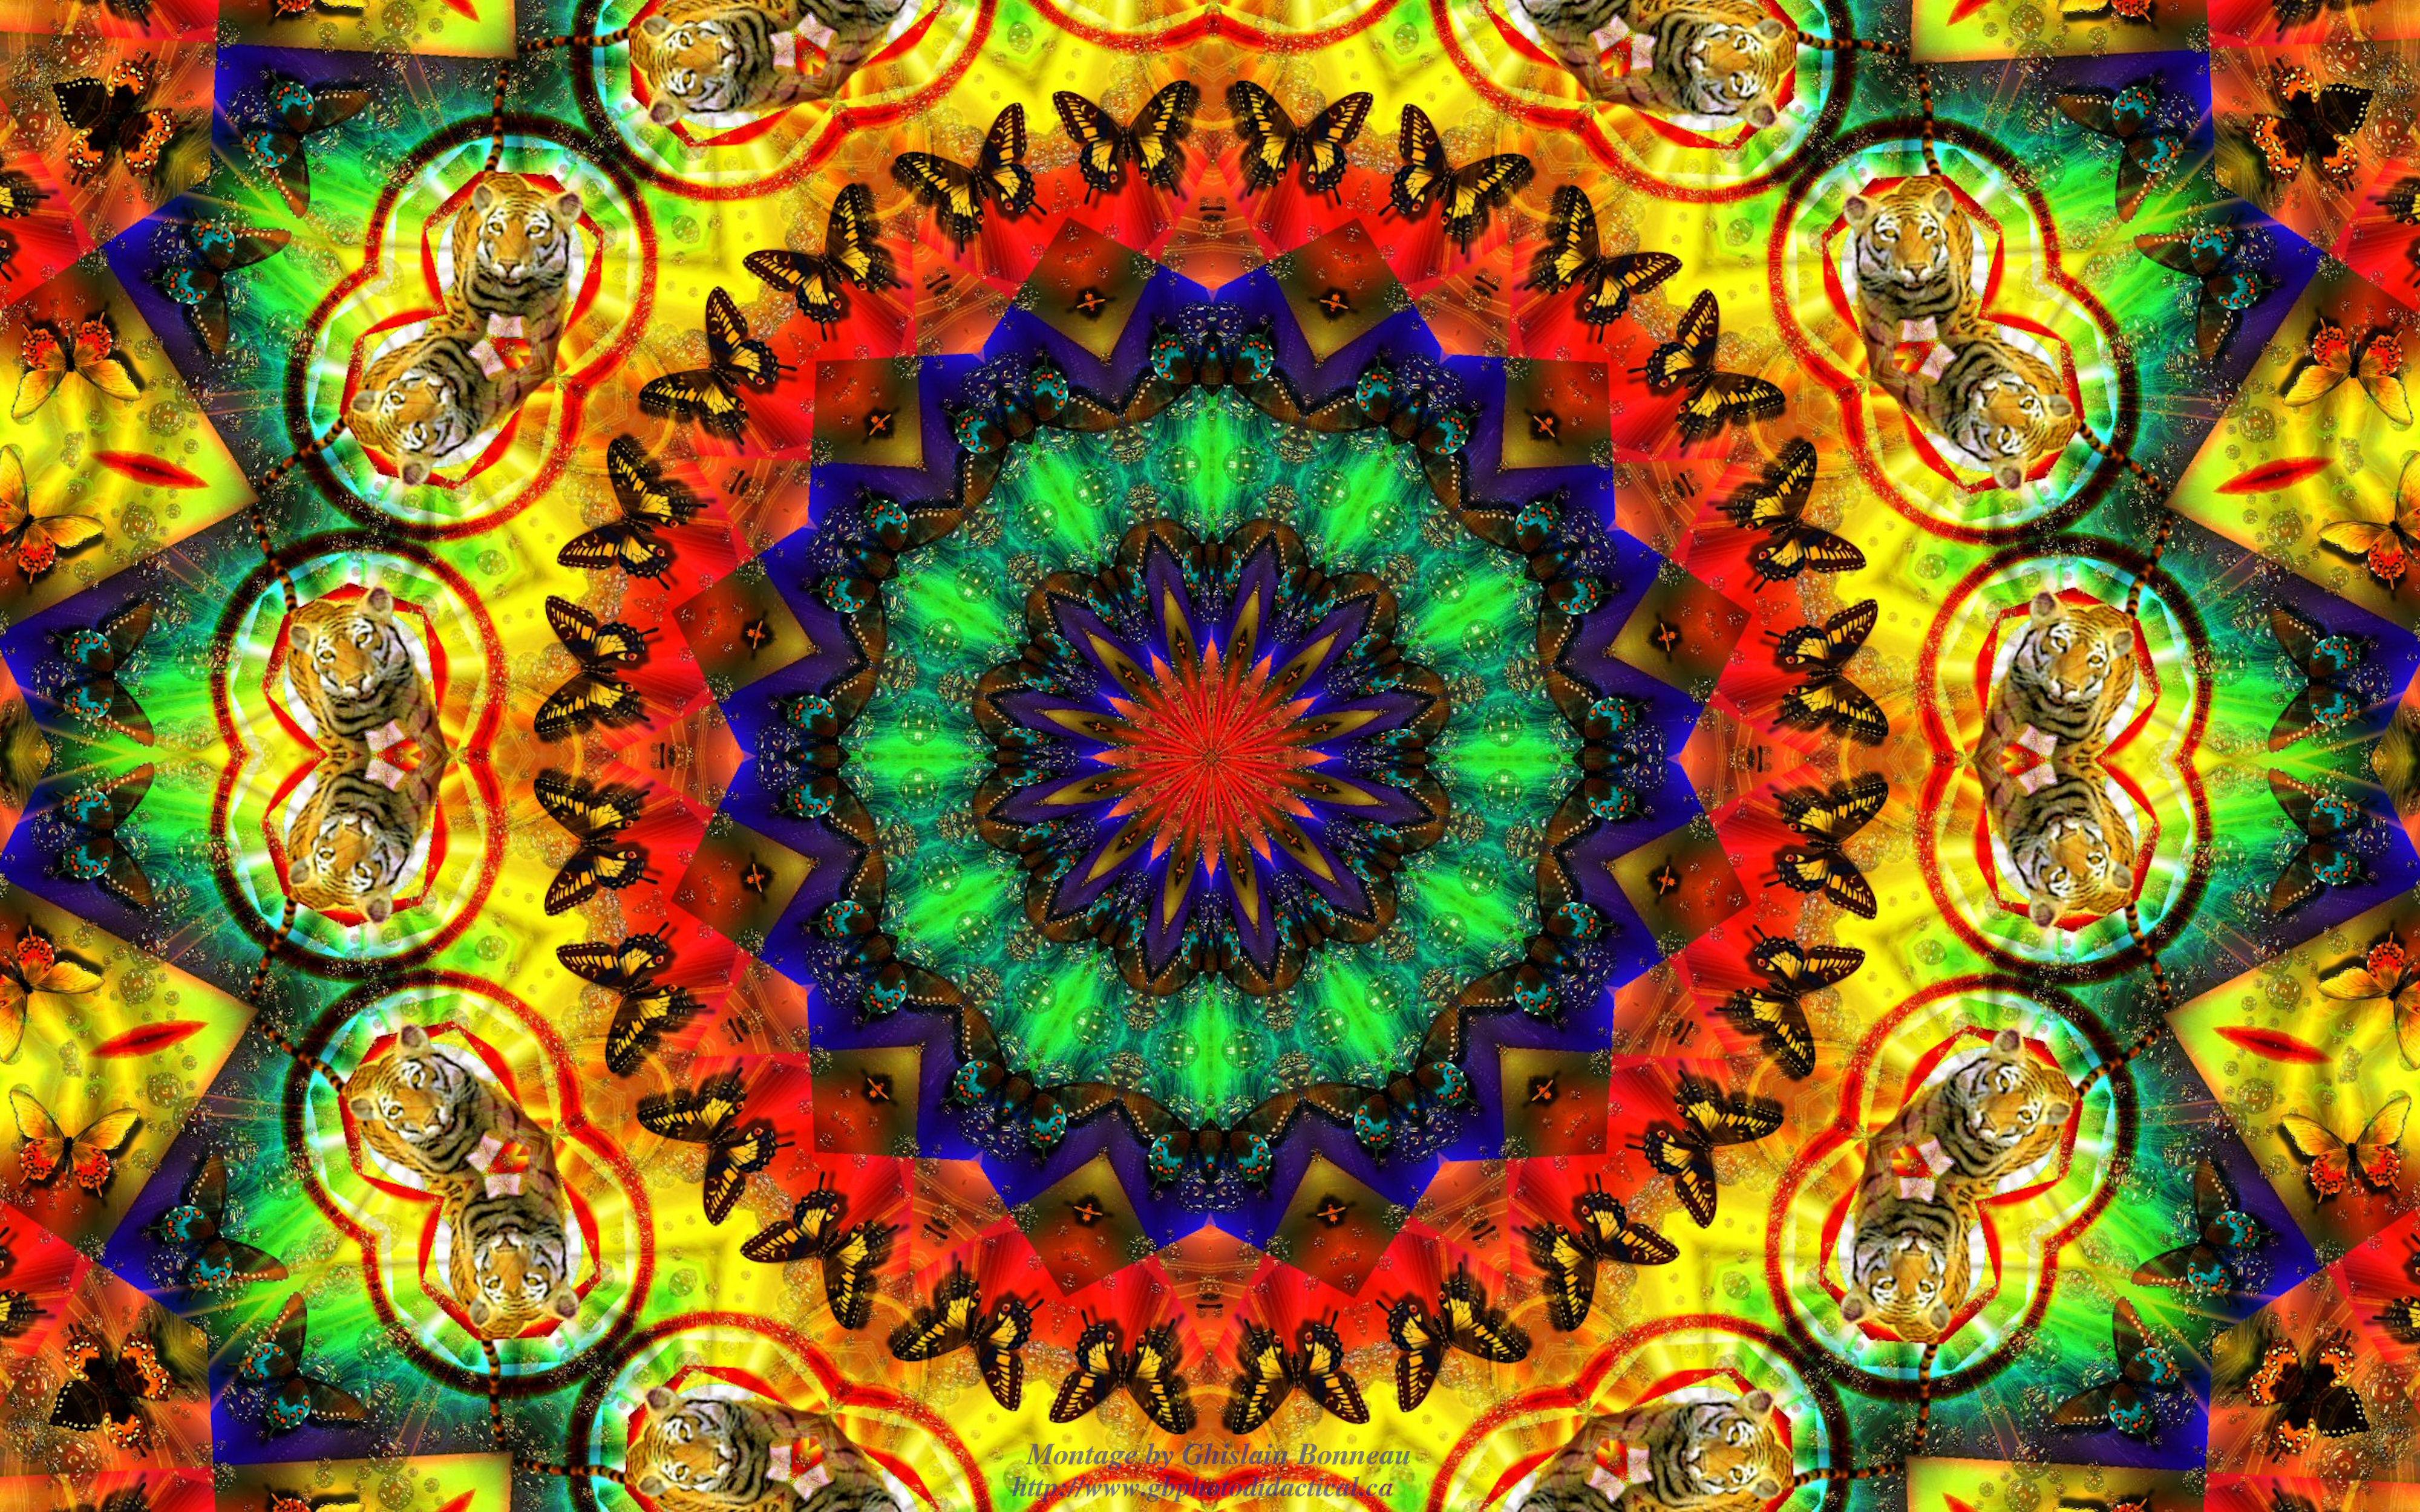 wallpaper psychedelic kaleidoscope 19 tiger 1 fs wallpaper psychedelic 4000x2500